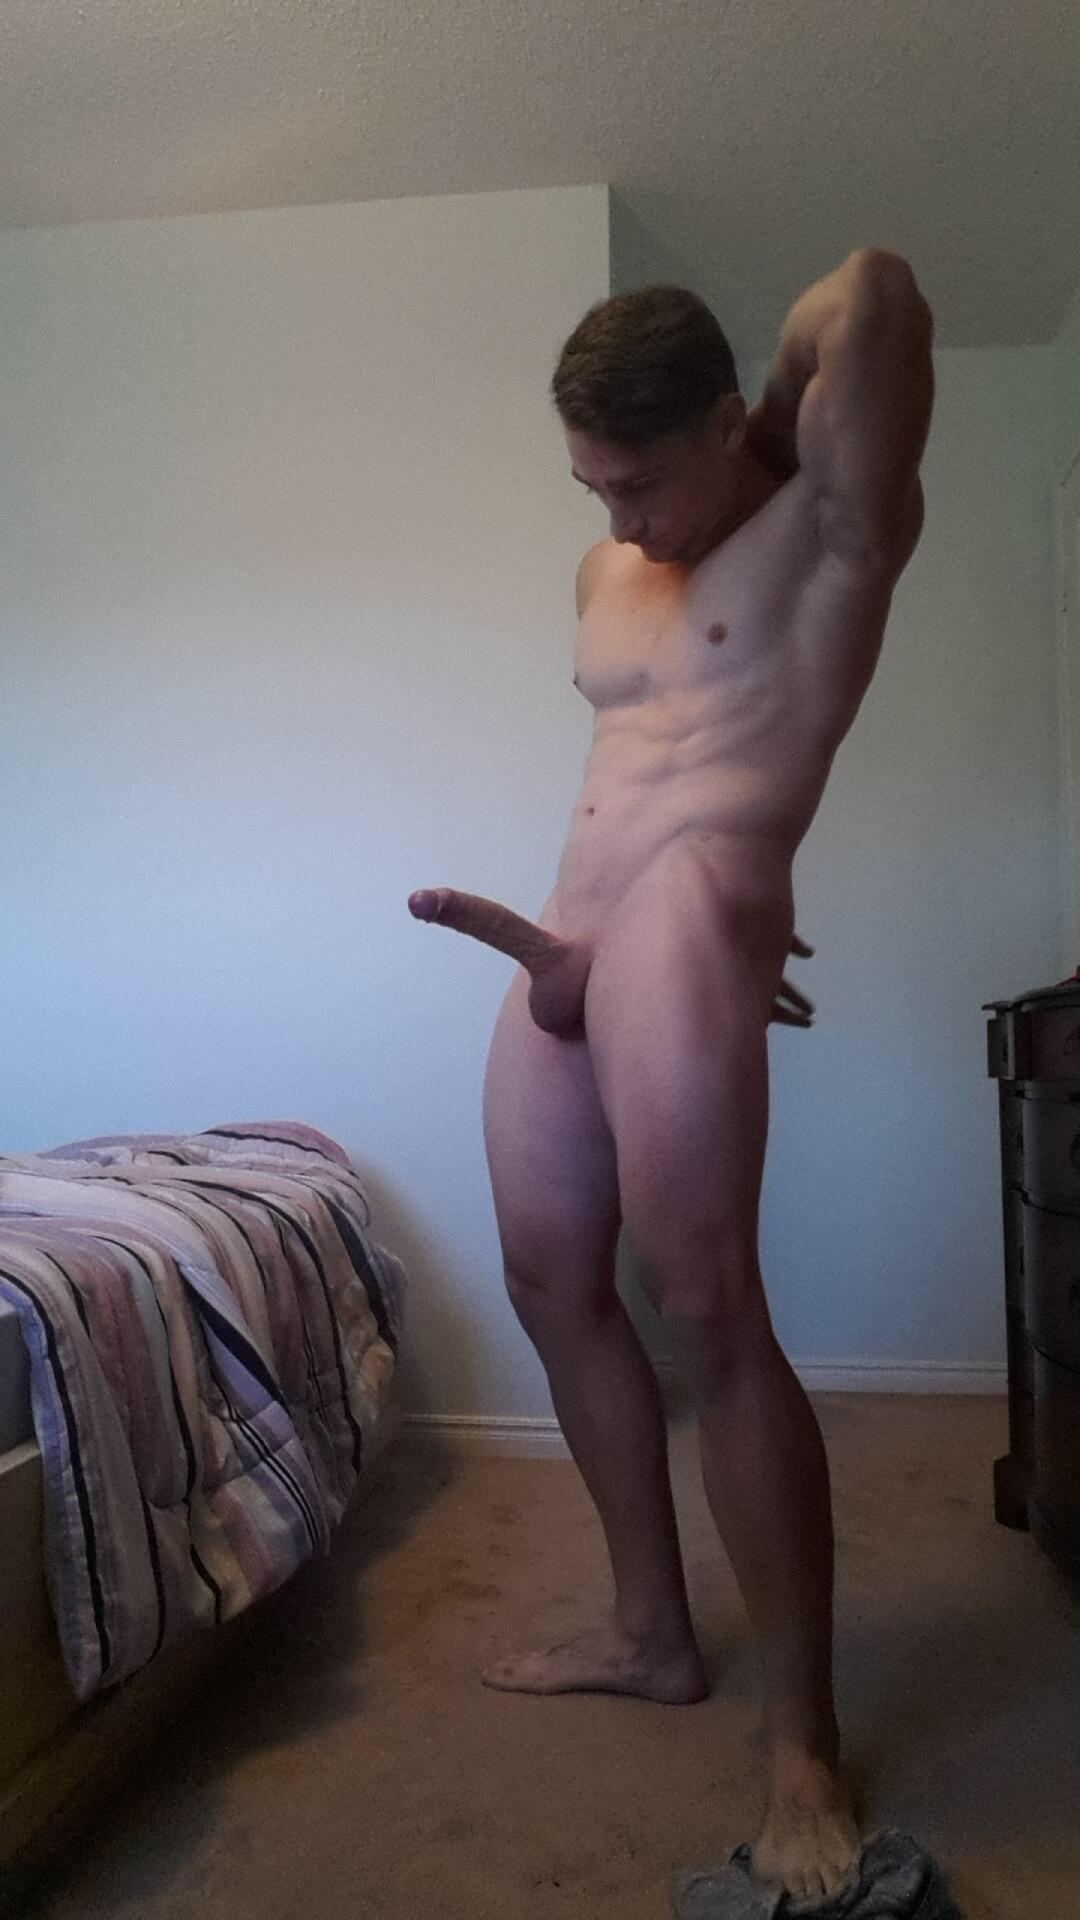 macho caliente